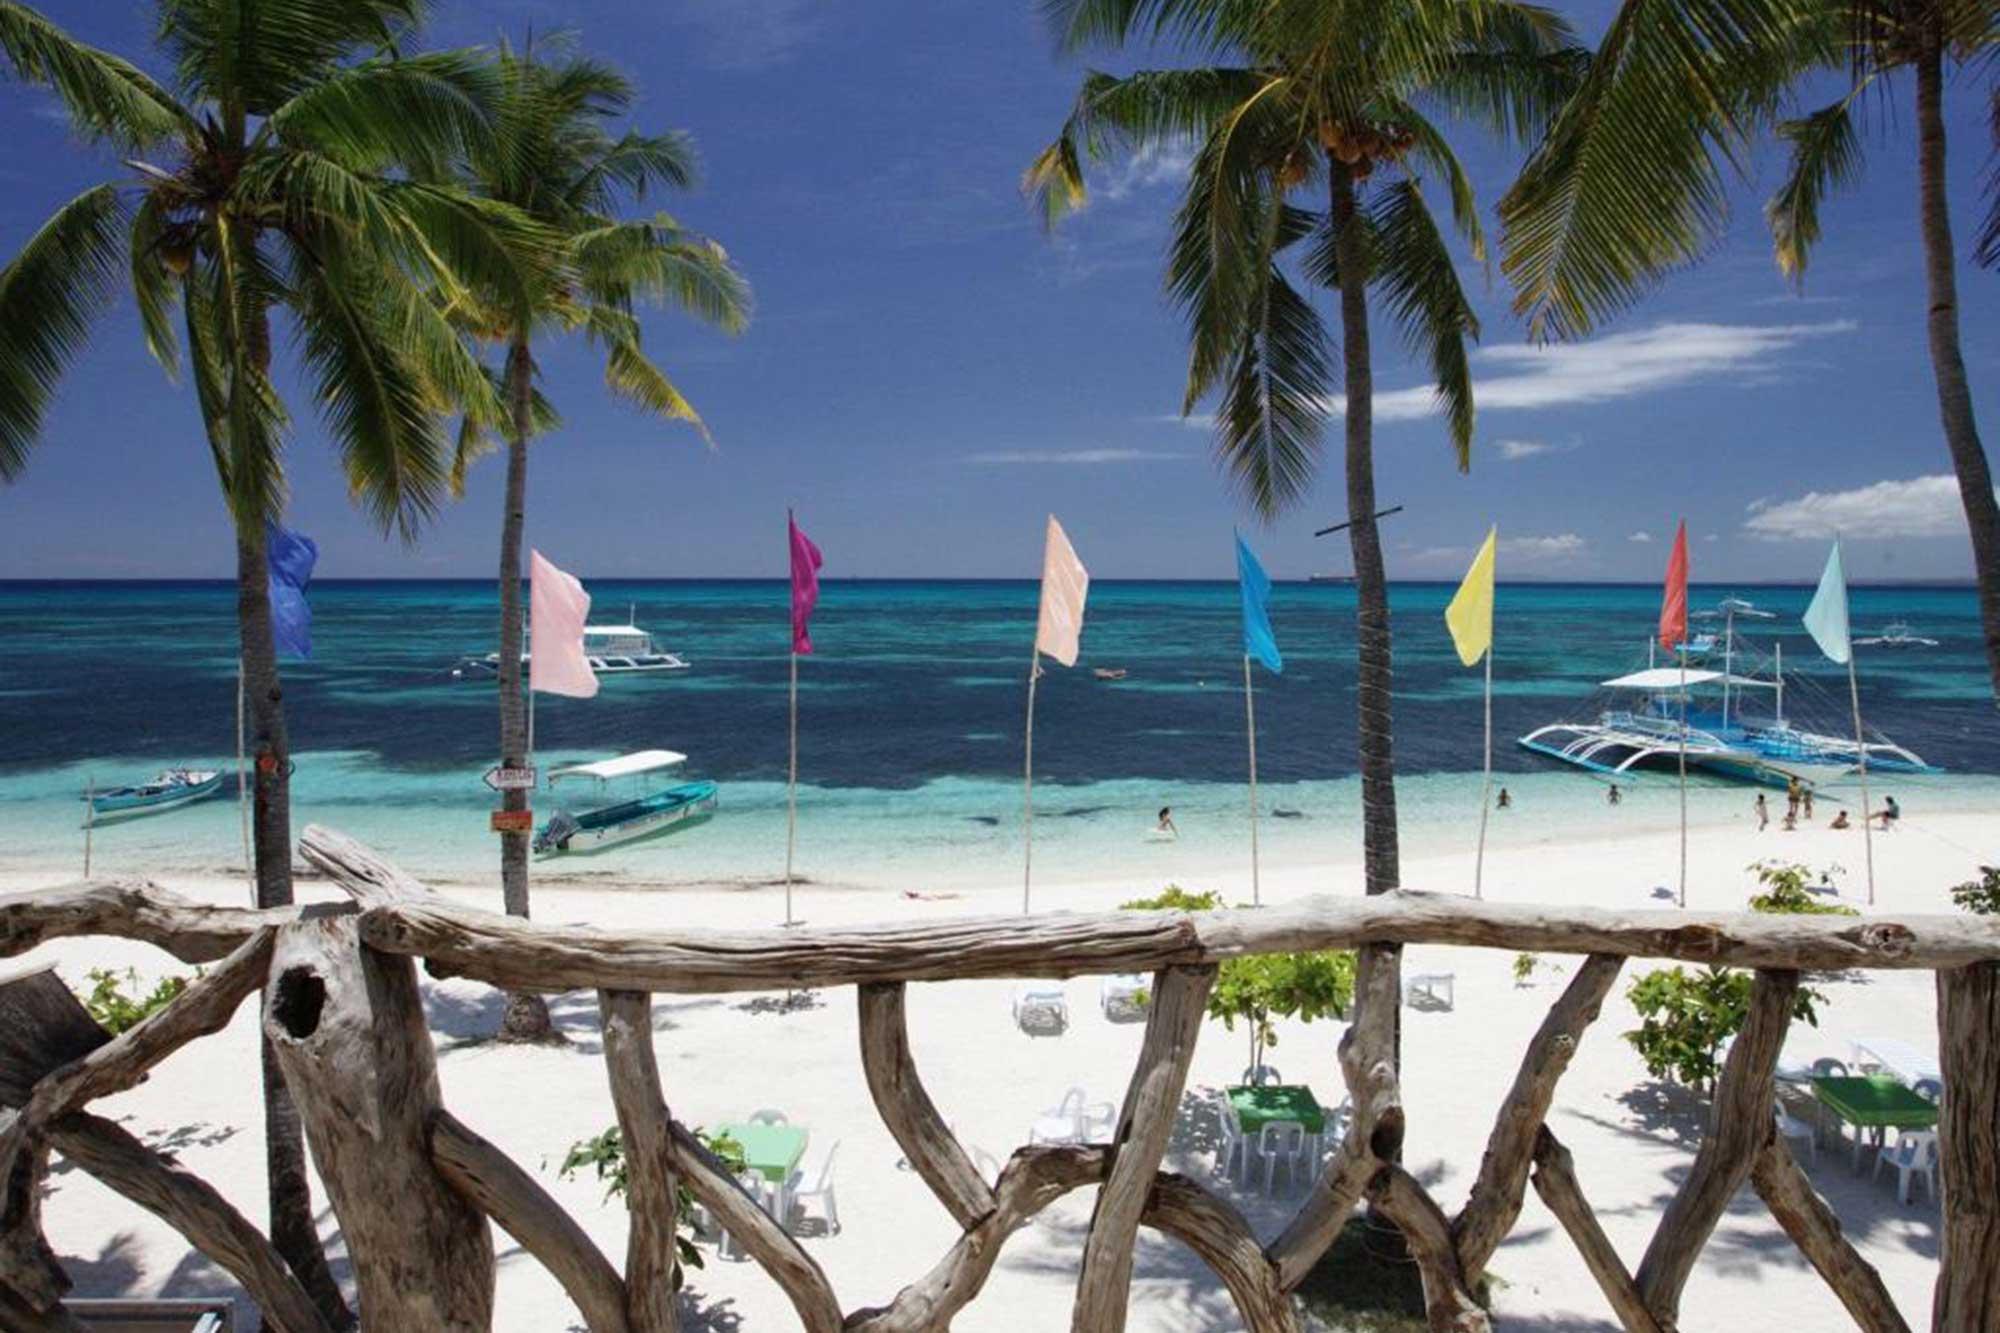 Malapascua Legends Water sports & Beach Resort